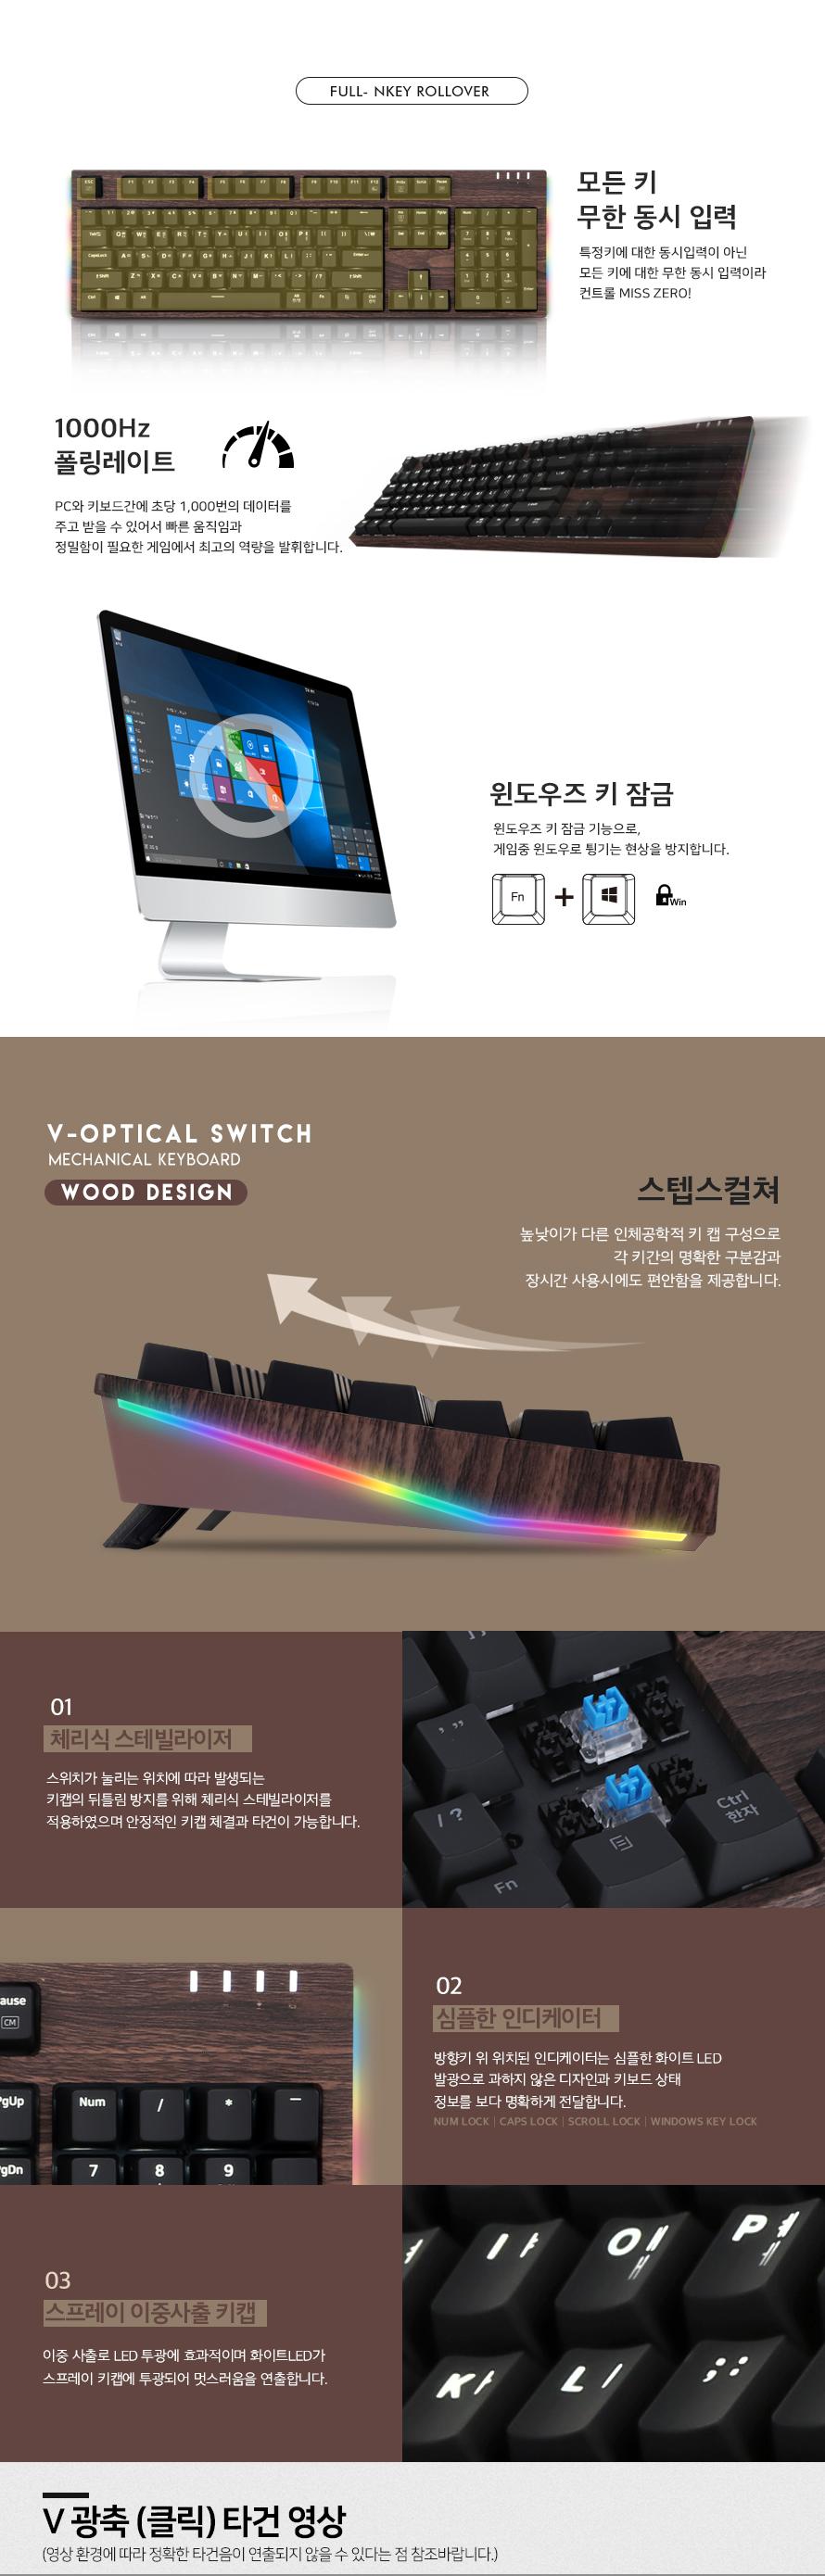 COX  CK777 WOOD V광축 완전방수 교체축 사이드 RGB 게이밍